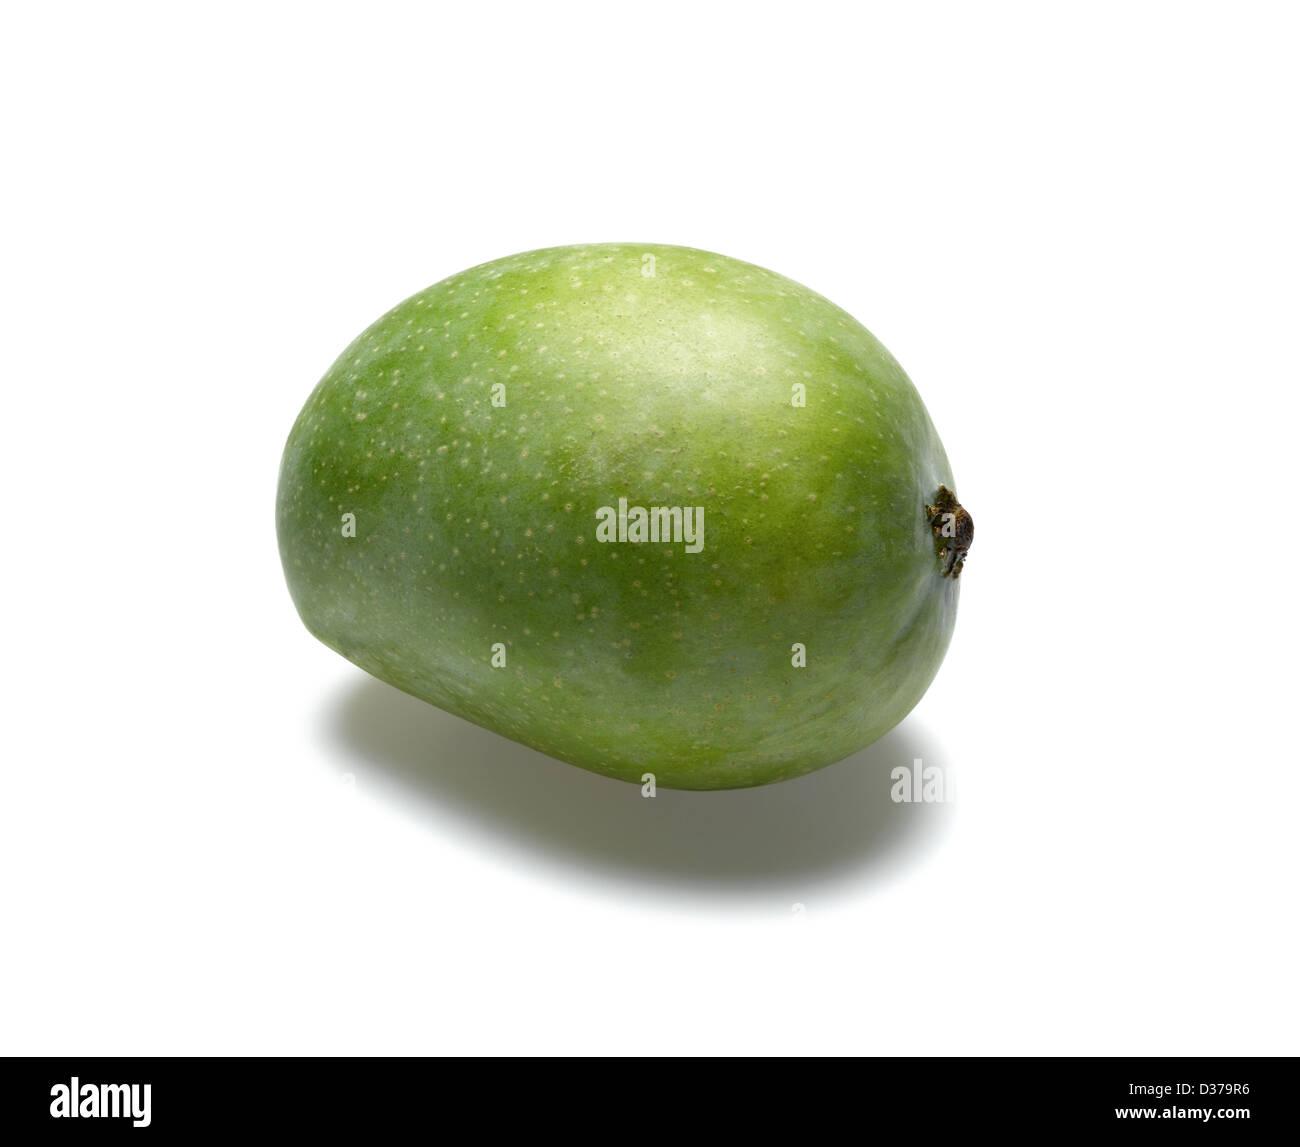 green mango - Stock Image